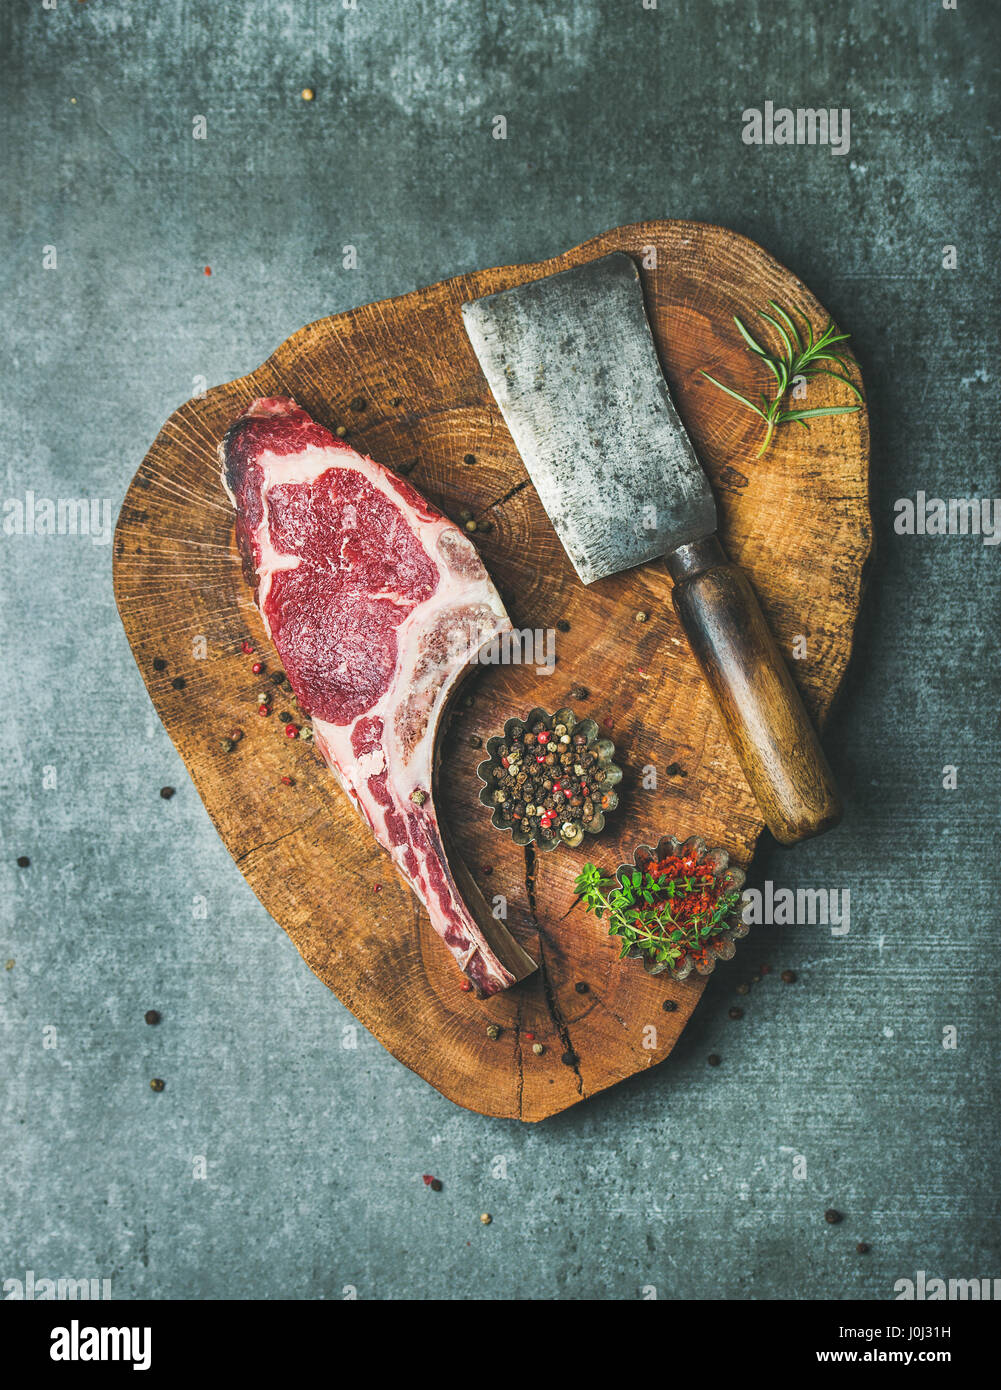 Trocken im Alter rohes Rindfleisch Rib-Eye Steak an Bord Stockbild